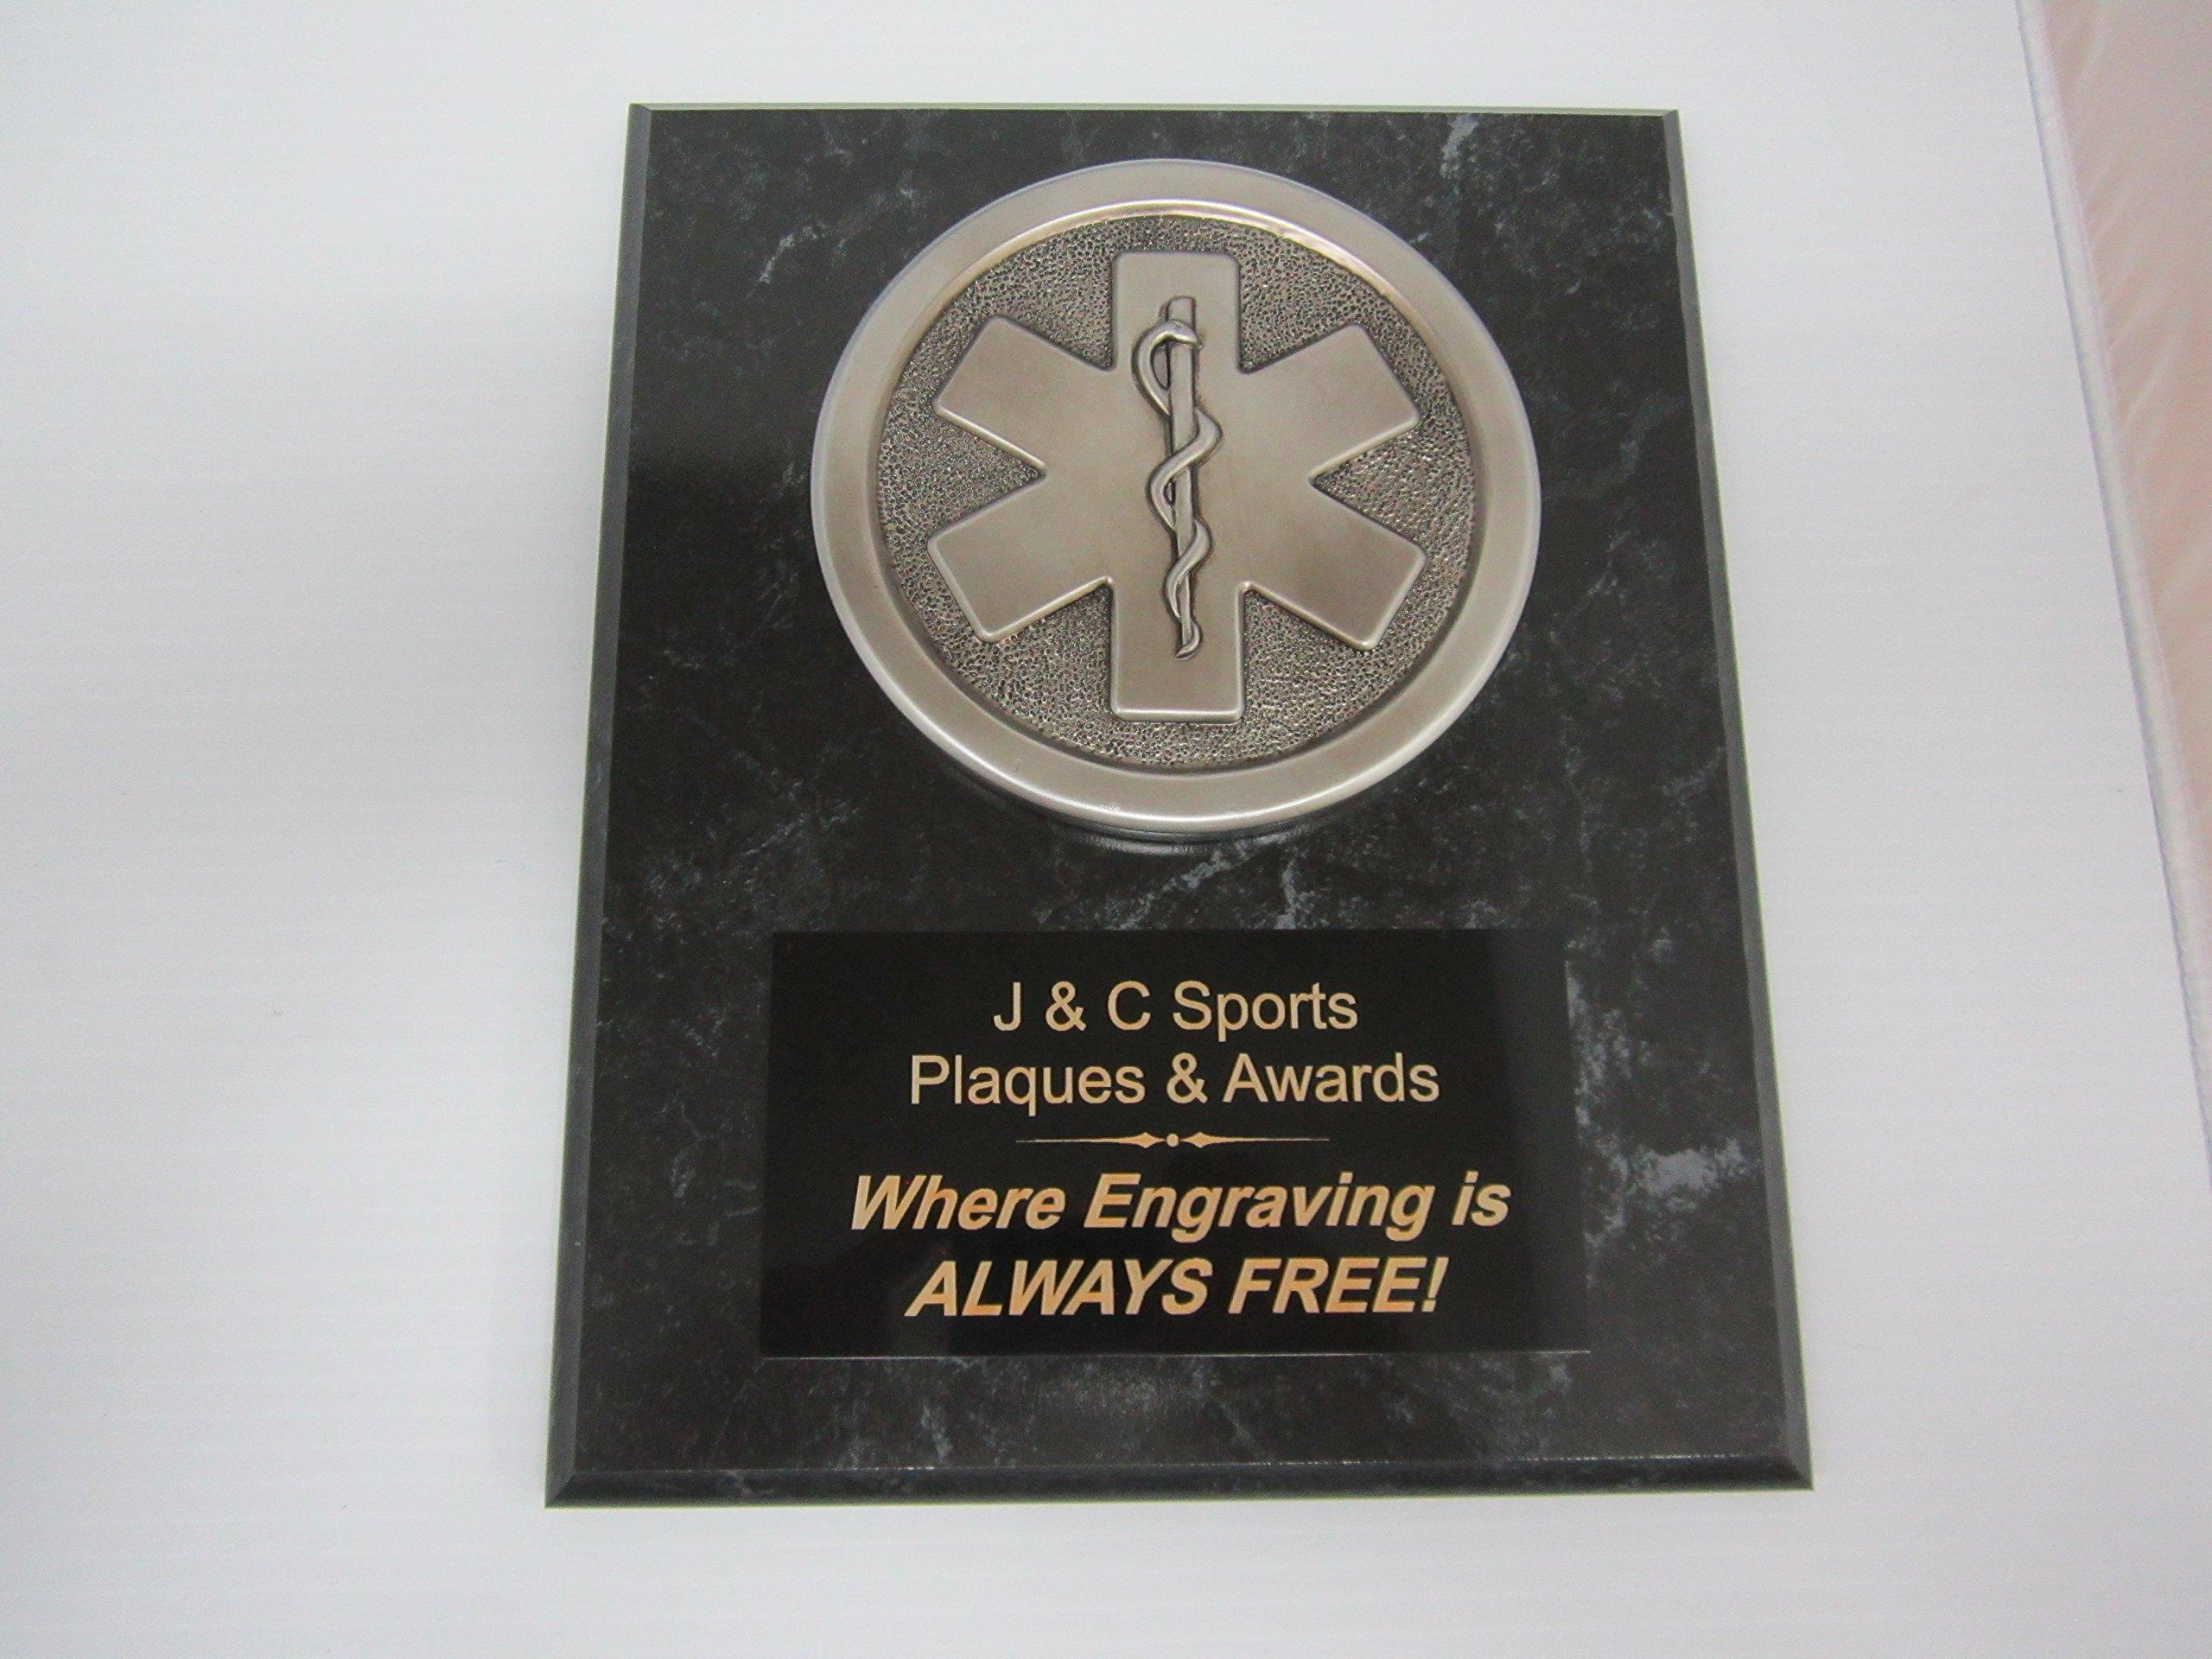 EMS EMT Paramedic Award Silver Plaque 8''x10'' FREE CUSTOM ENGRAVING Black Marble Finish w/Plaque Mount